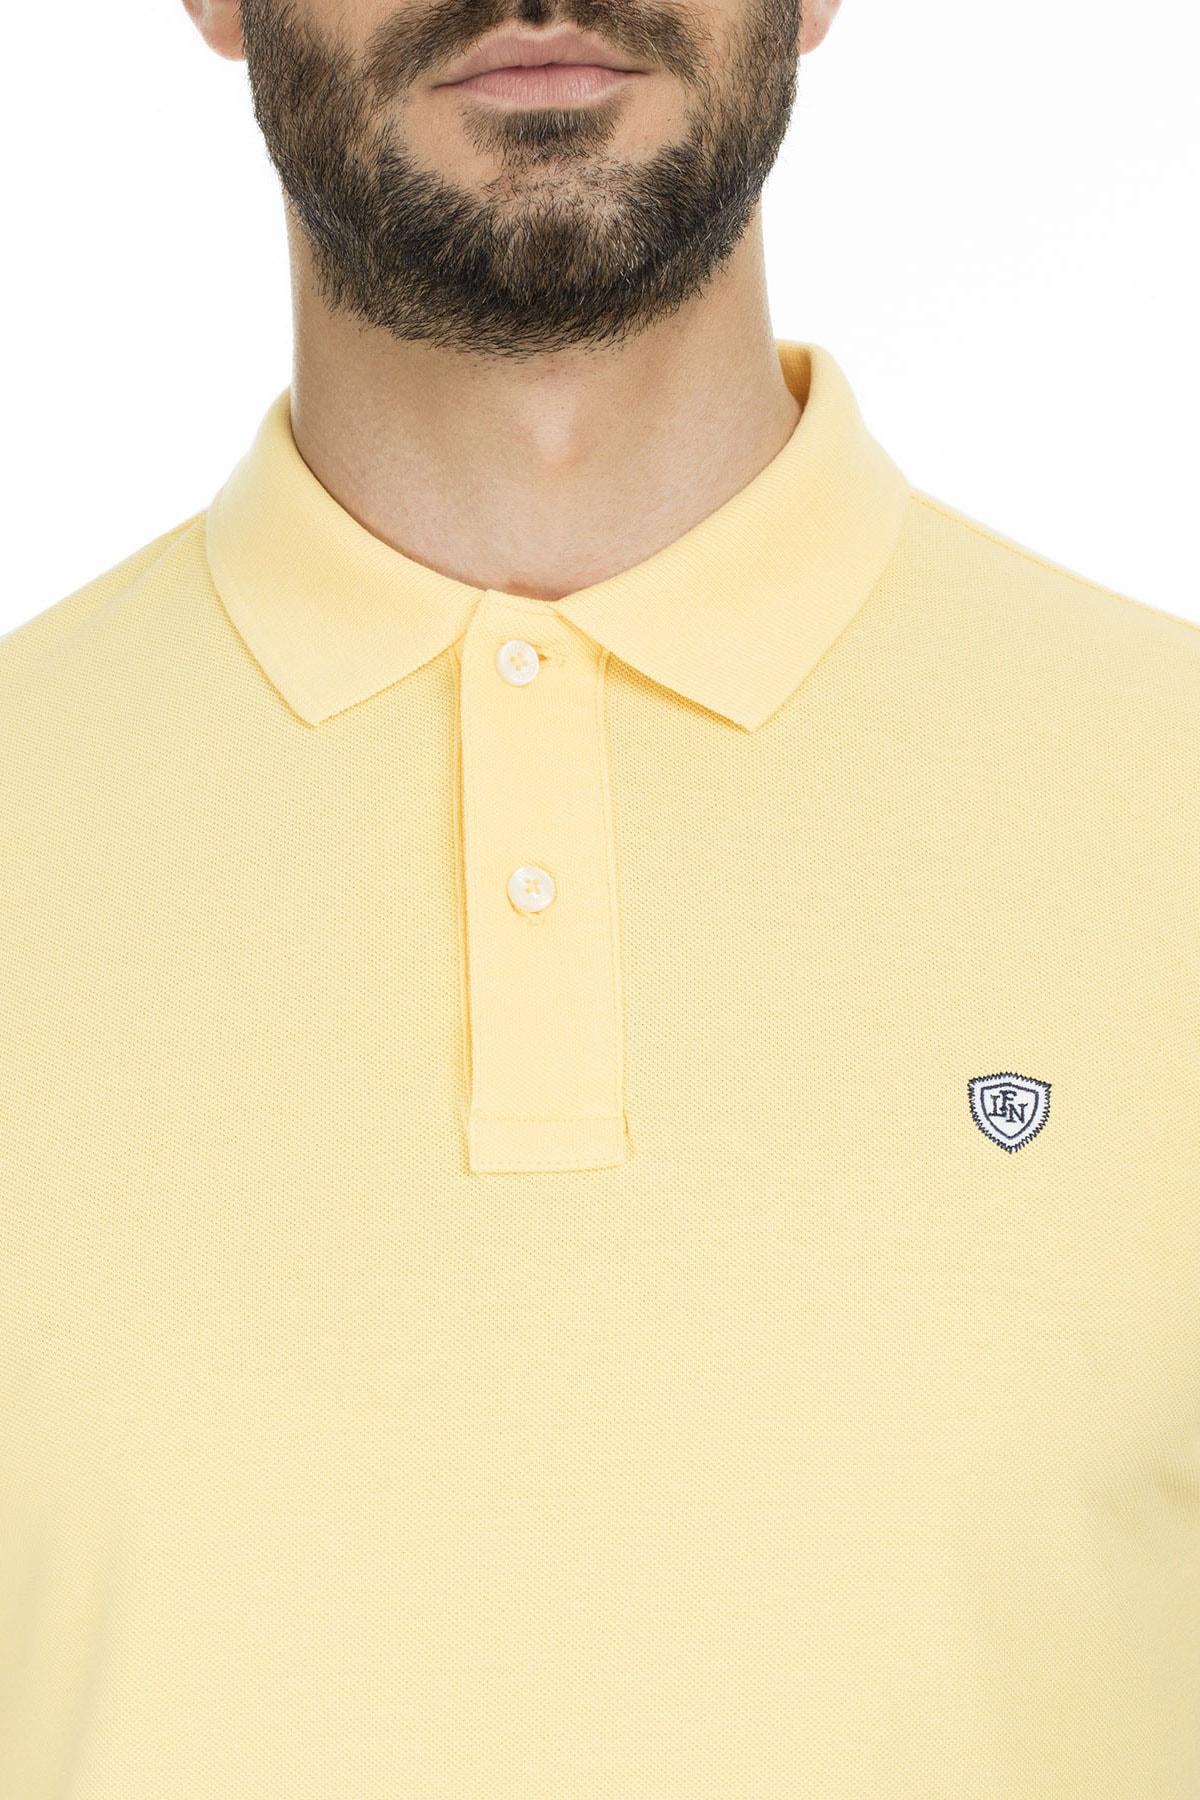 Lufian Laon Spor Polo T- Shirt Sarı 4